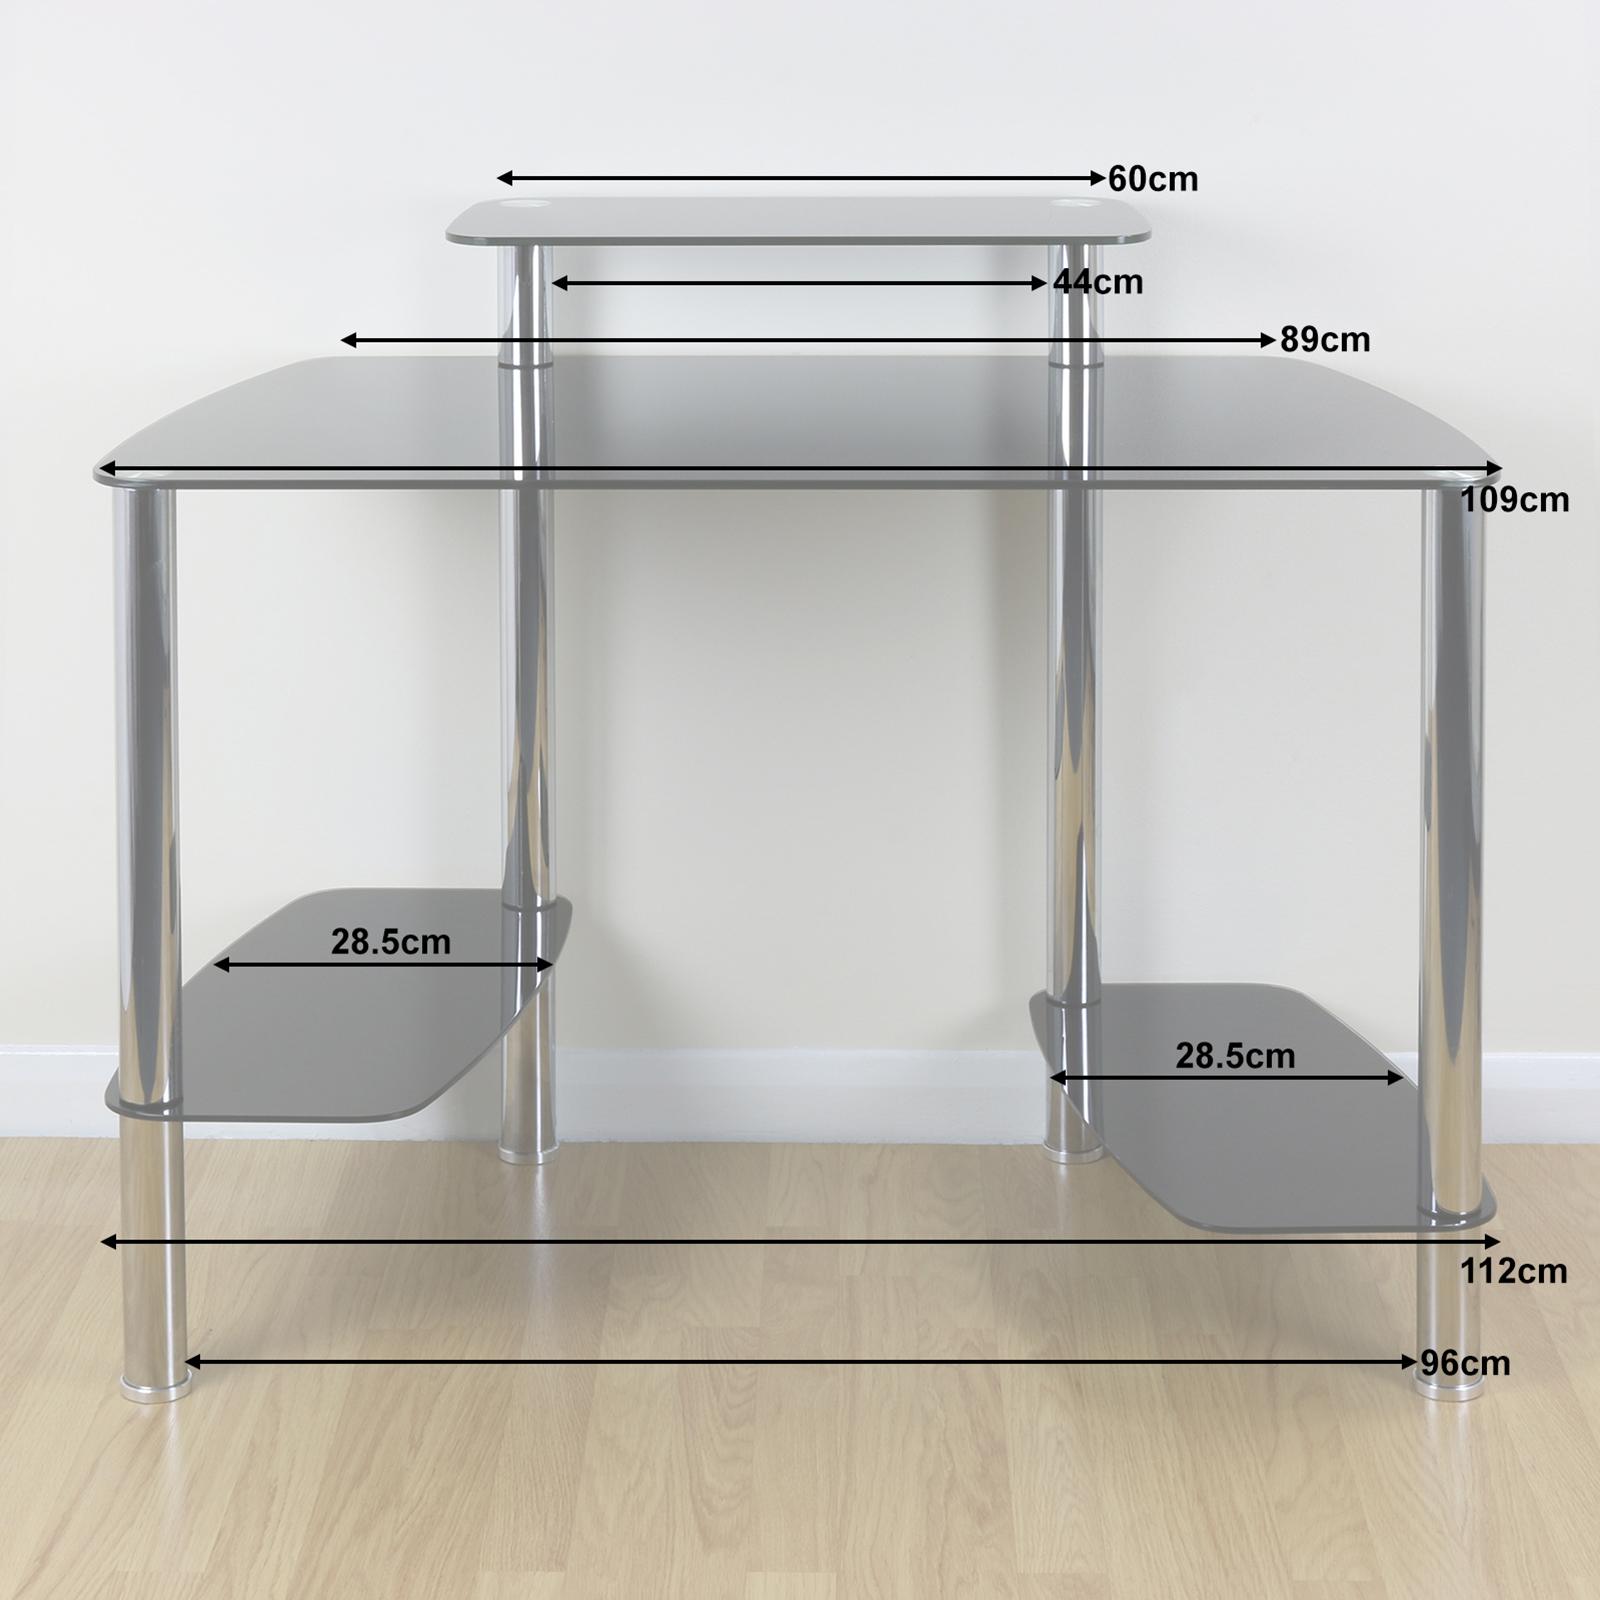 Sentinel Large Black Glass Office Computer Pc Desk Stand Cpu Tower Shelf Monitor Riser